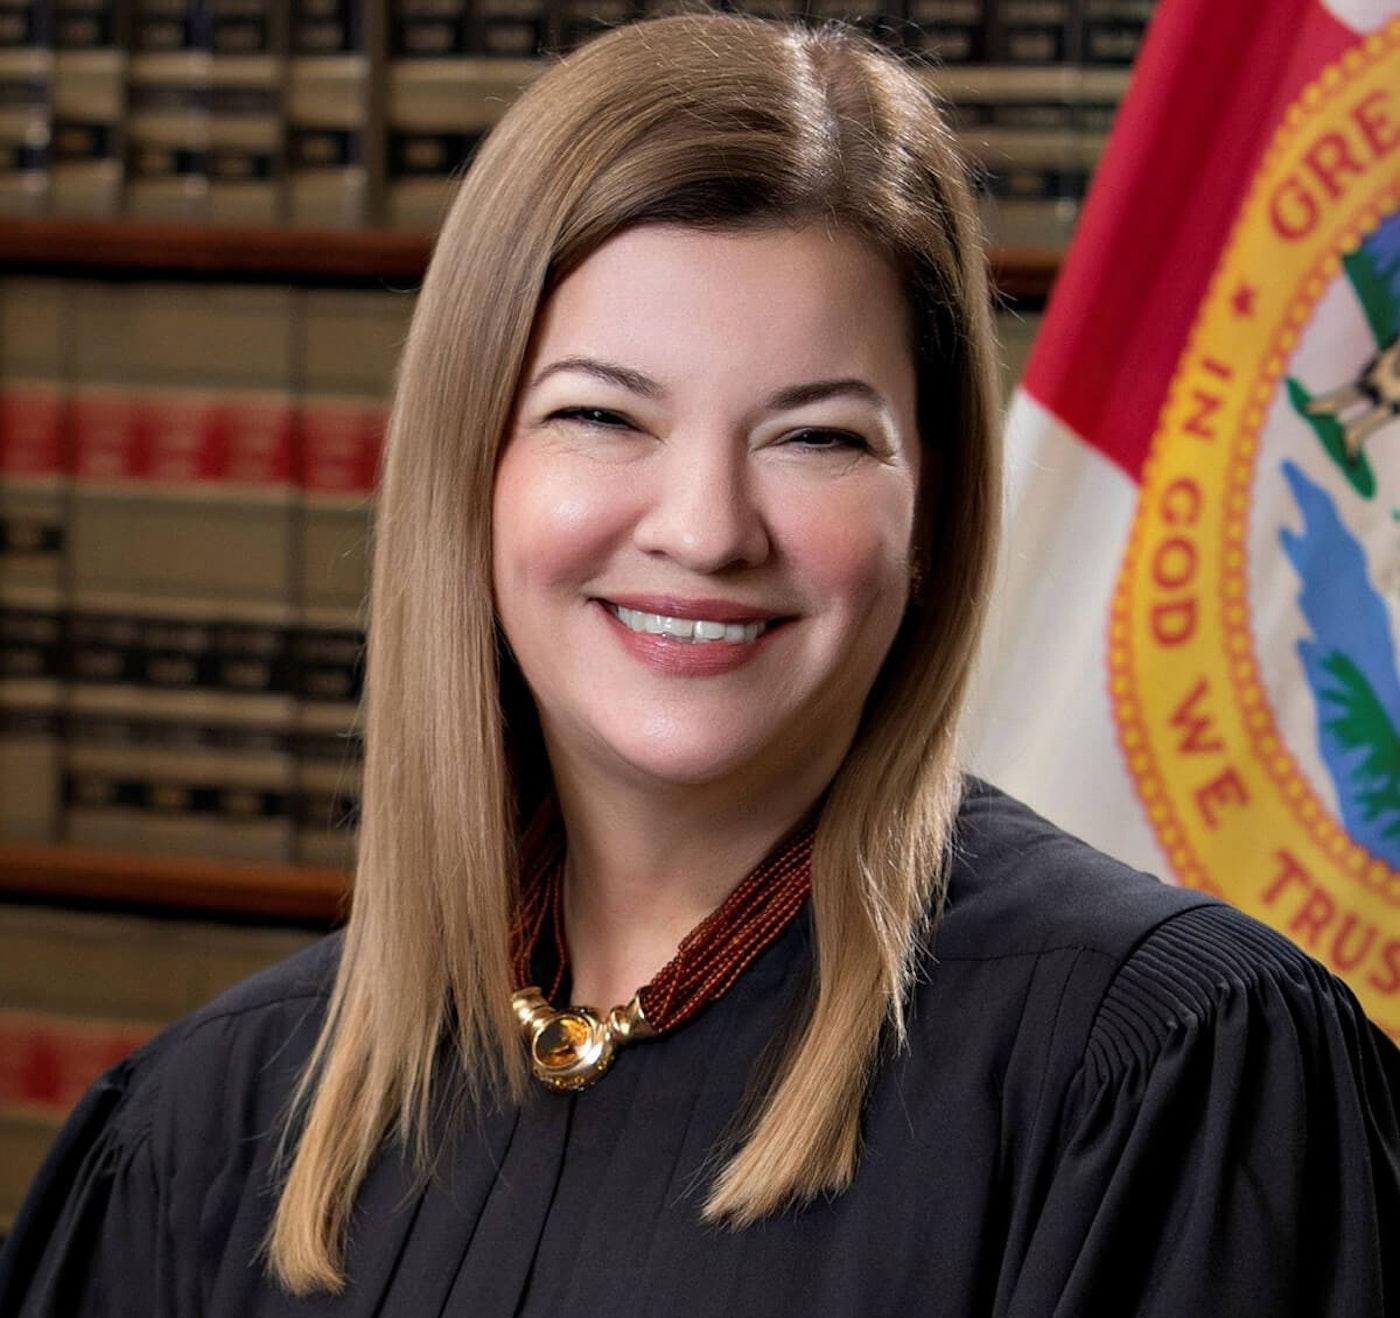 Barbara-Lagoa-Trump